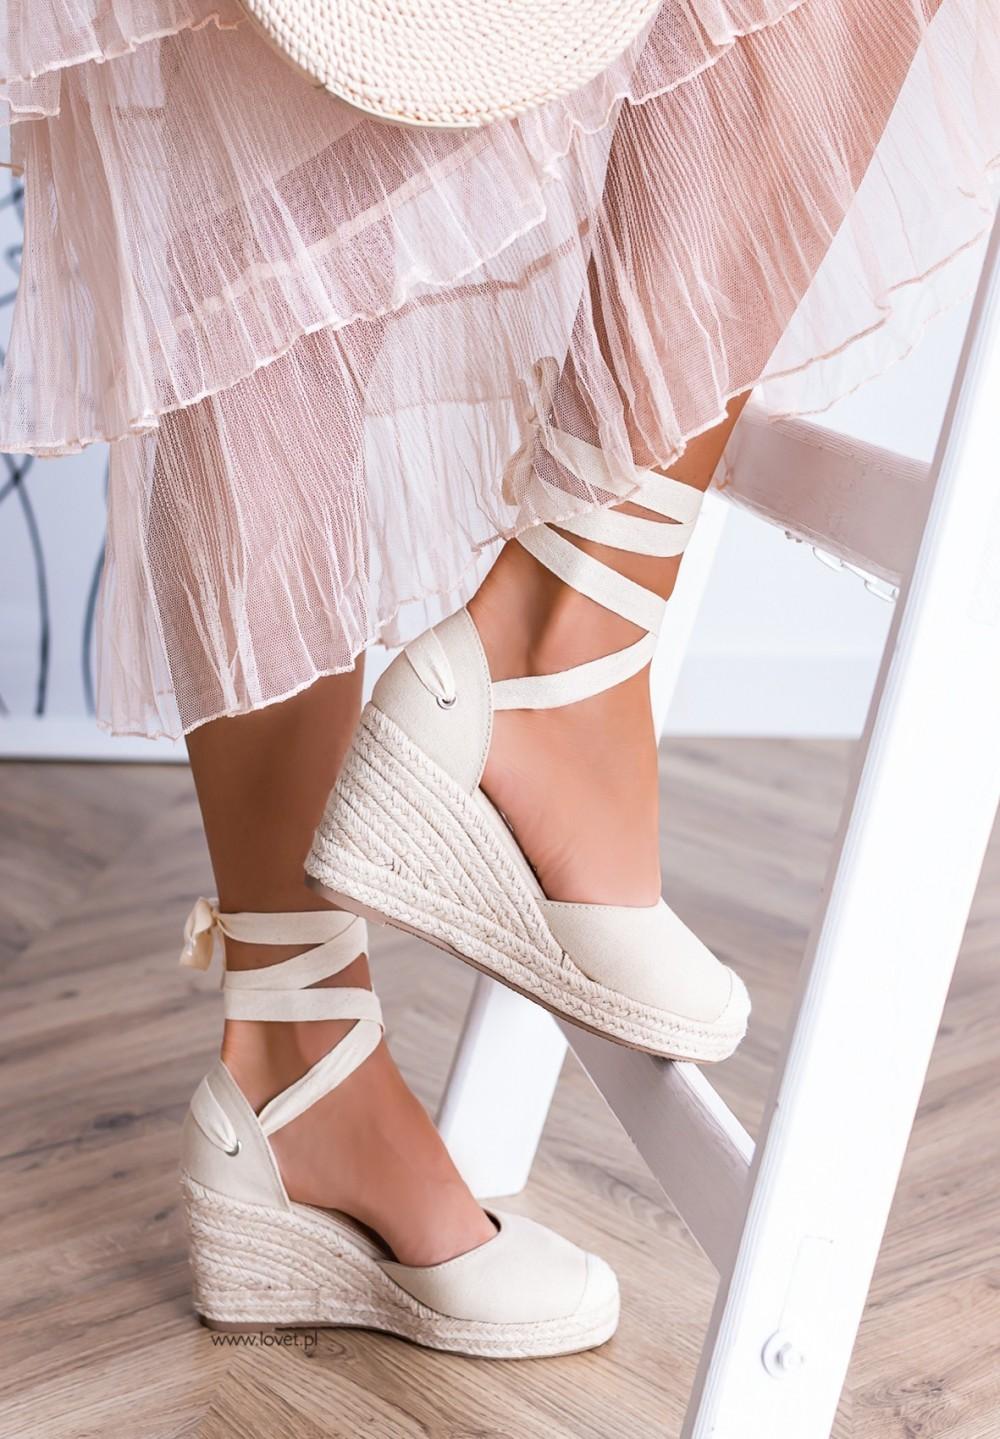 Sandały Espadryle Koturny Beżowe Maddie